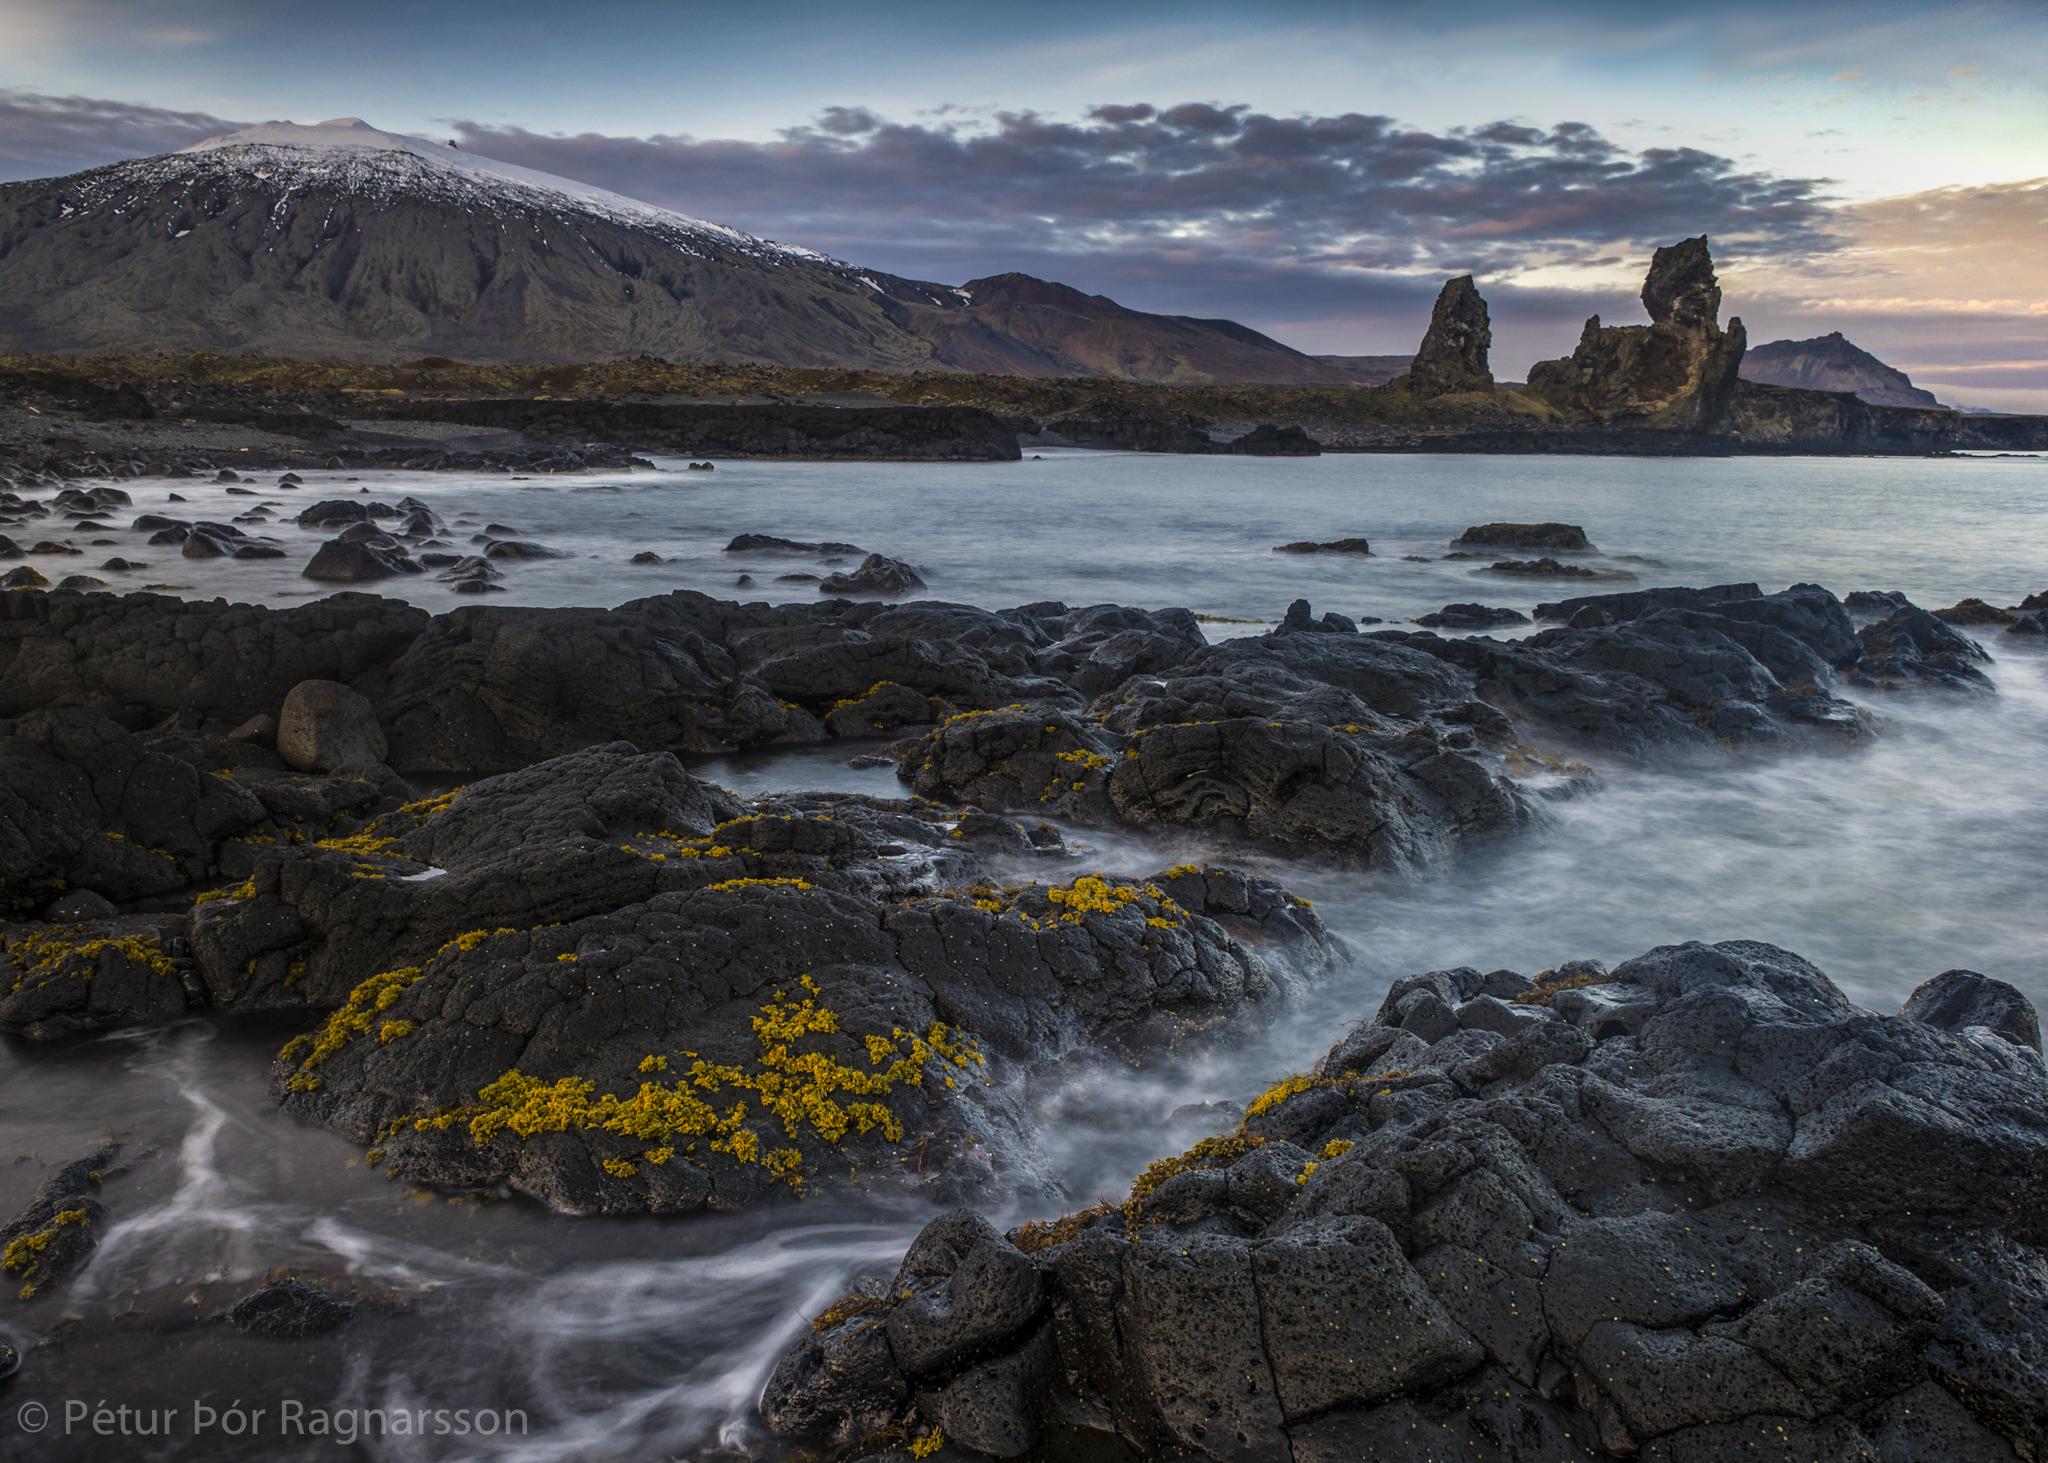 Lóndrangar seastacks with Snæfellsjökull glacier in the background